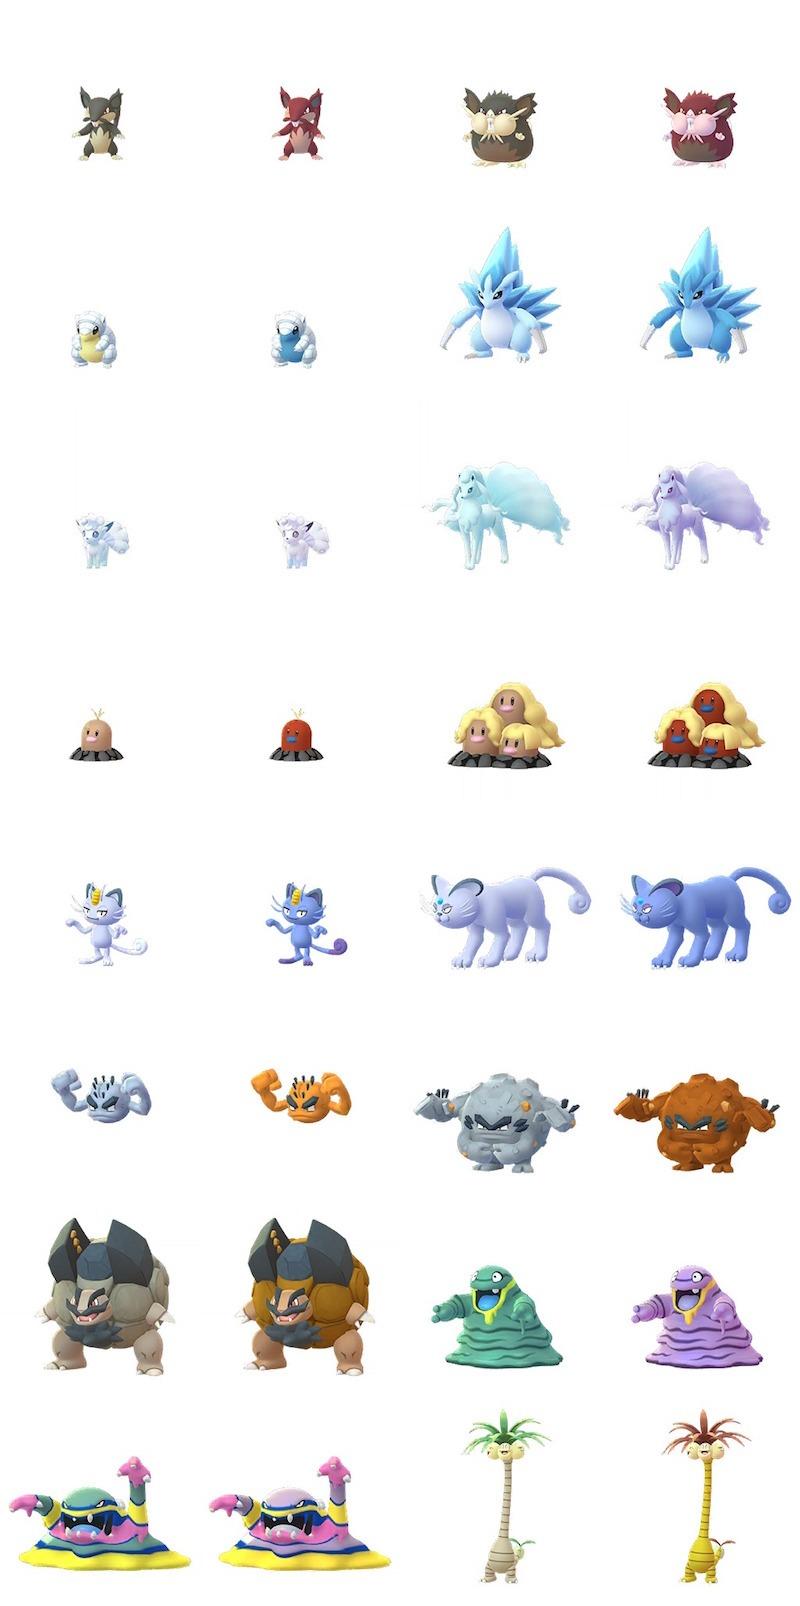 Pokémon GO Forme Alola cromatiche